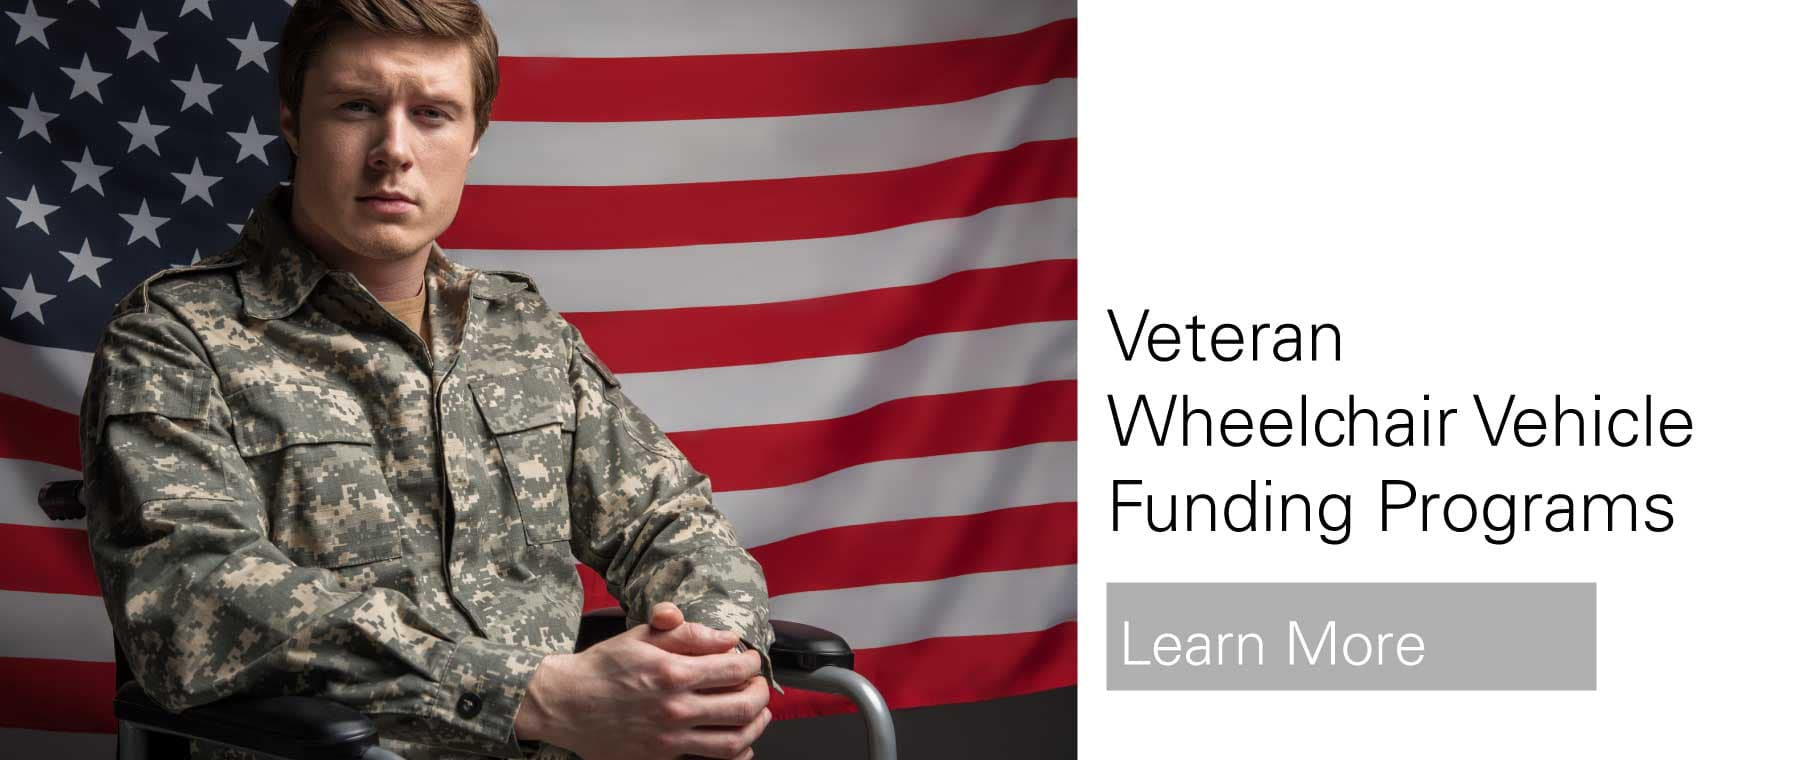 Veterans Wheelchair Vehicle Funding